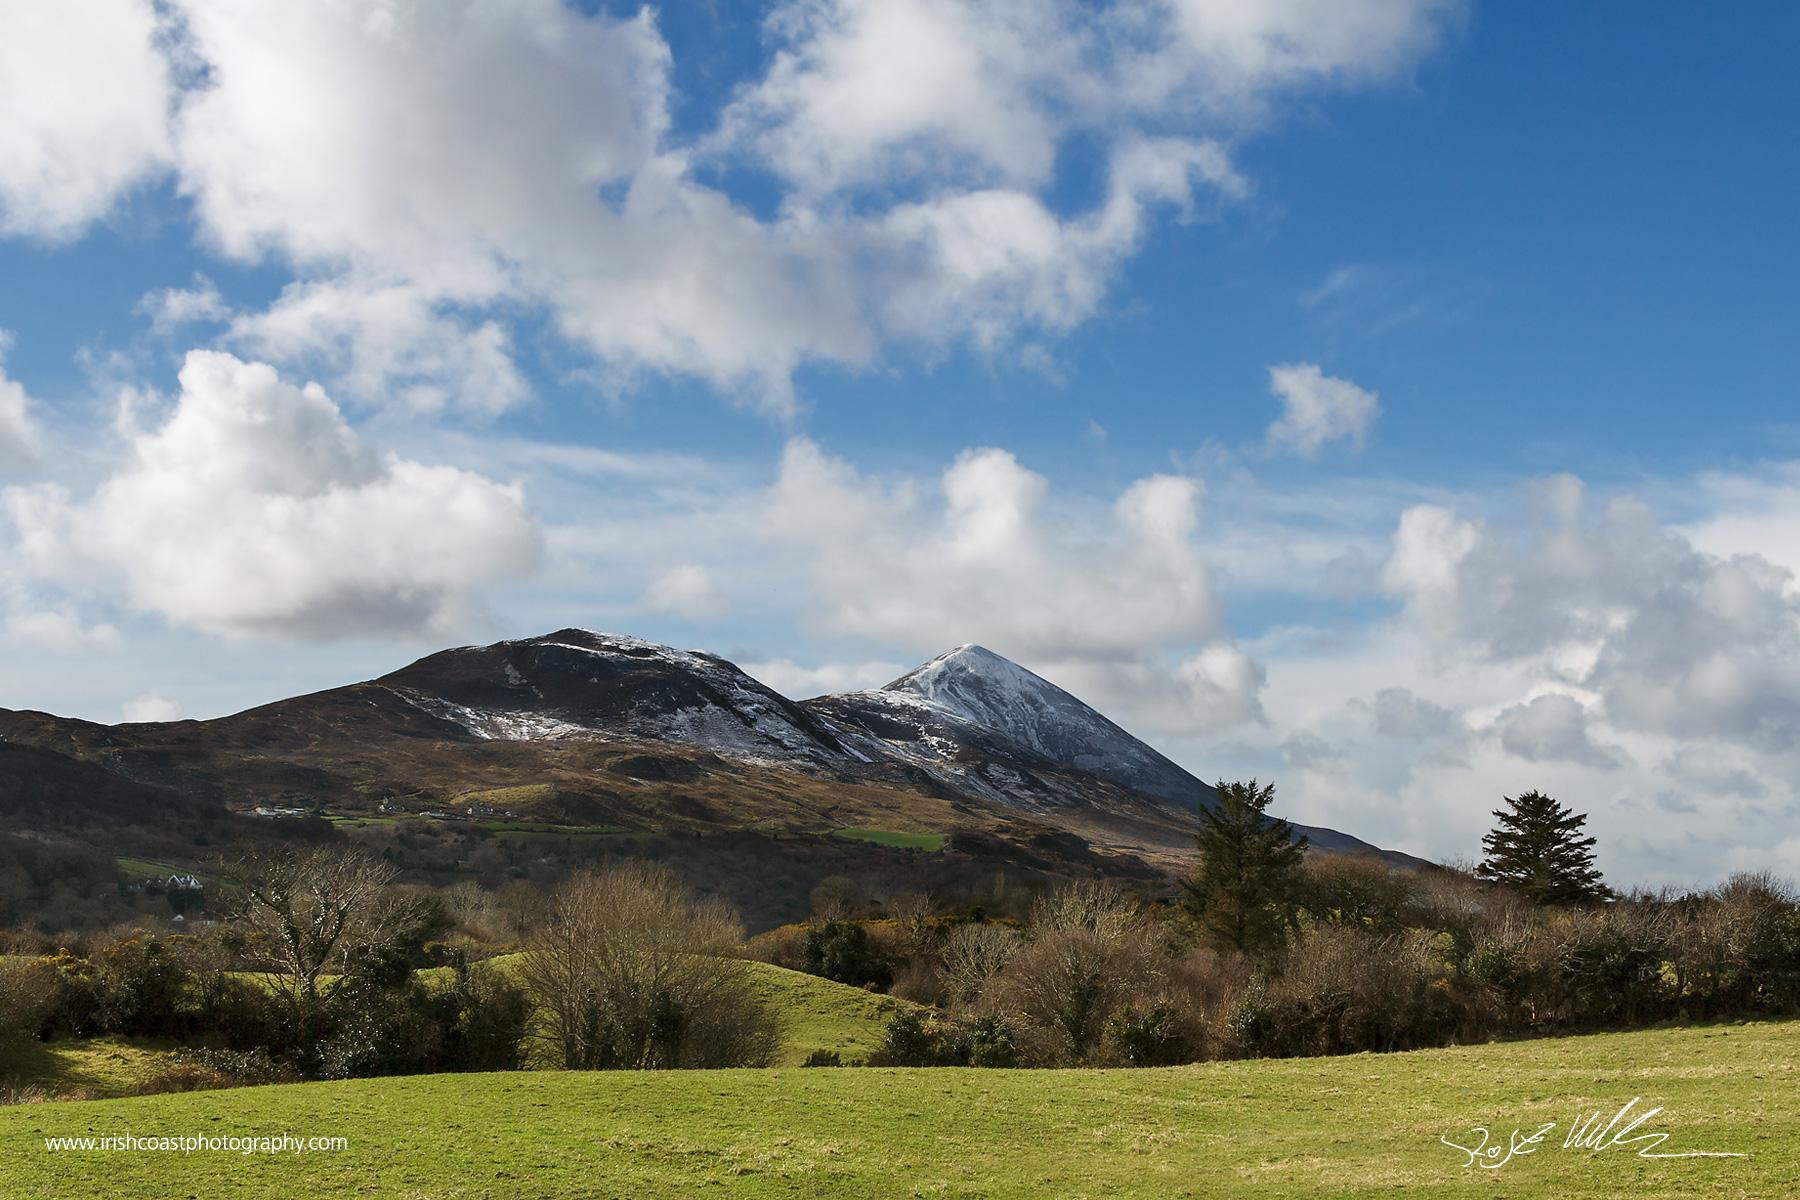 Snowcapped Croagh Patrick